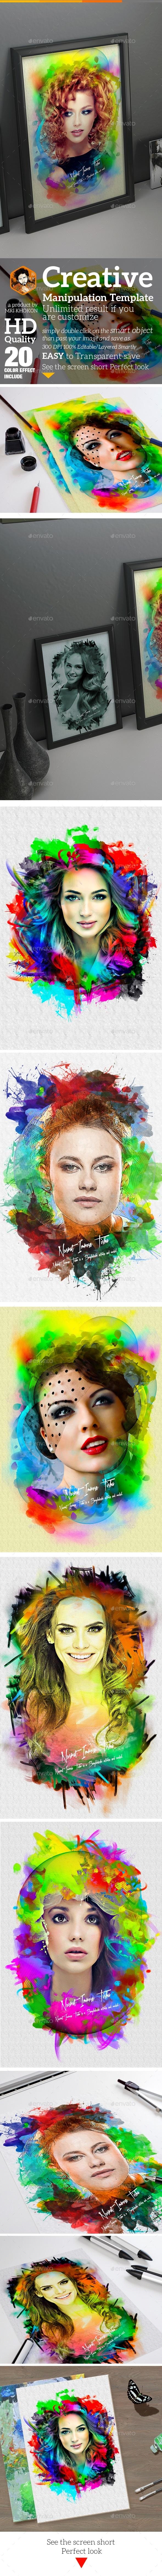 Creative Photo Manipulation Templates - Artistic Photo Templates